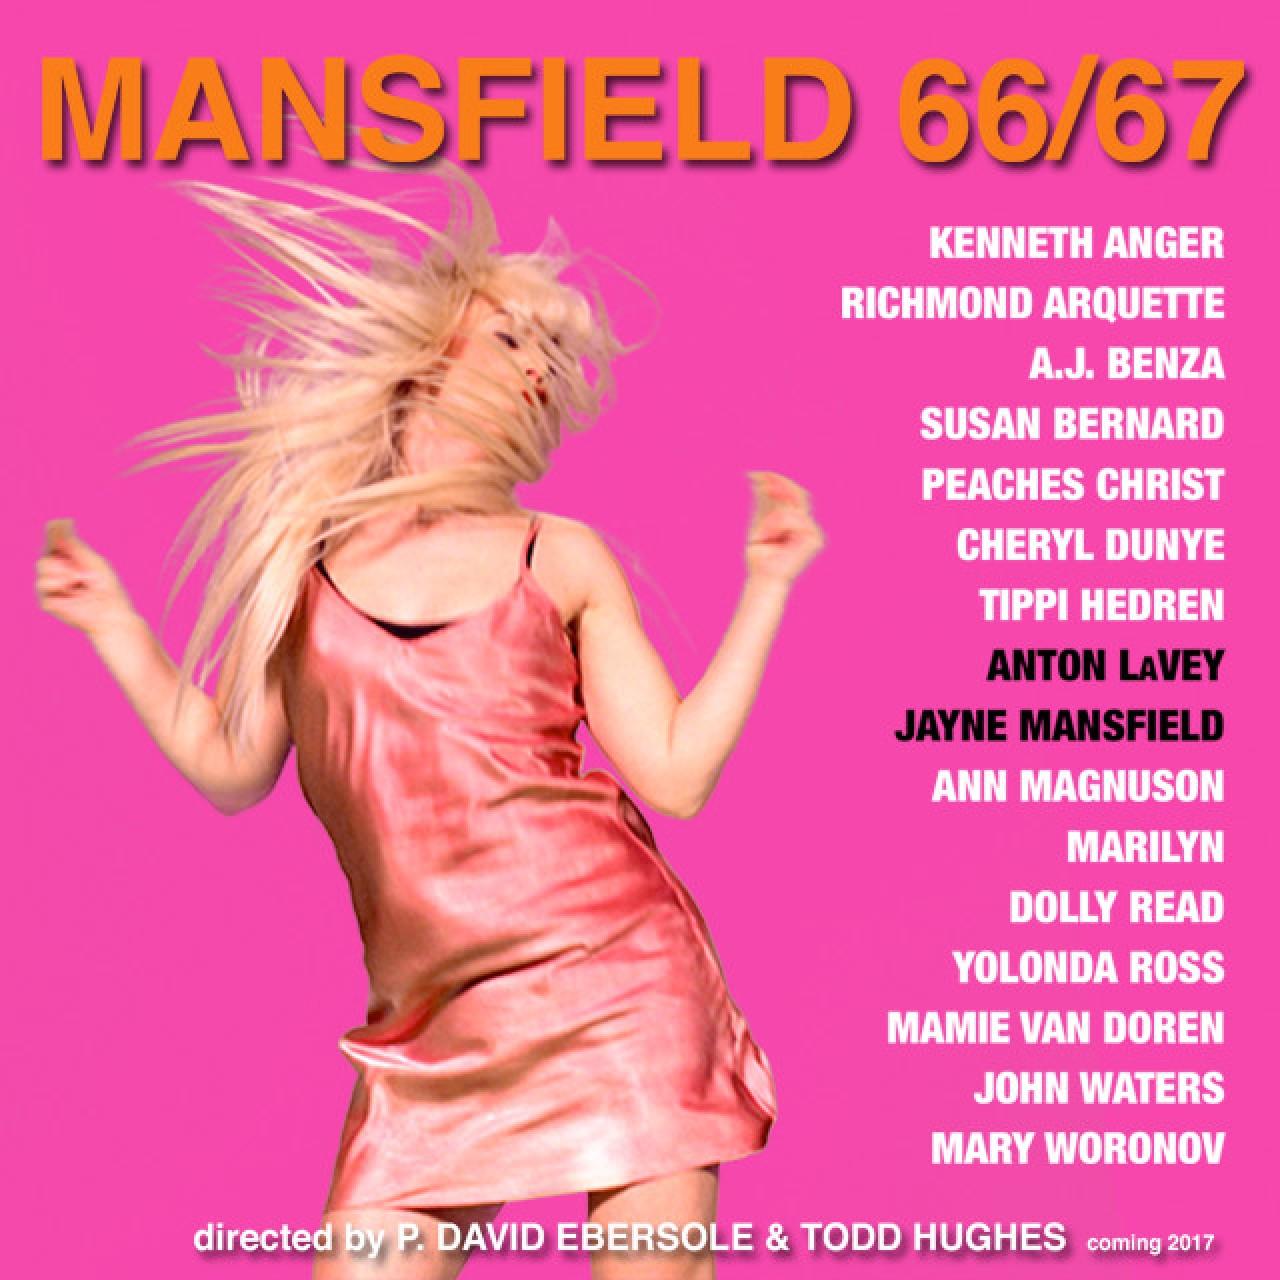 Mansfield 66/67 - 1